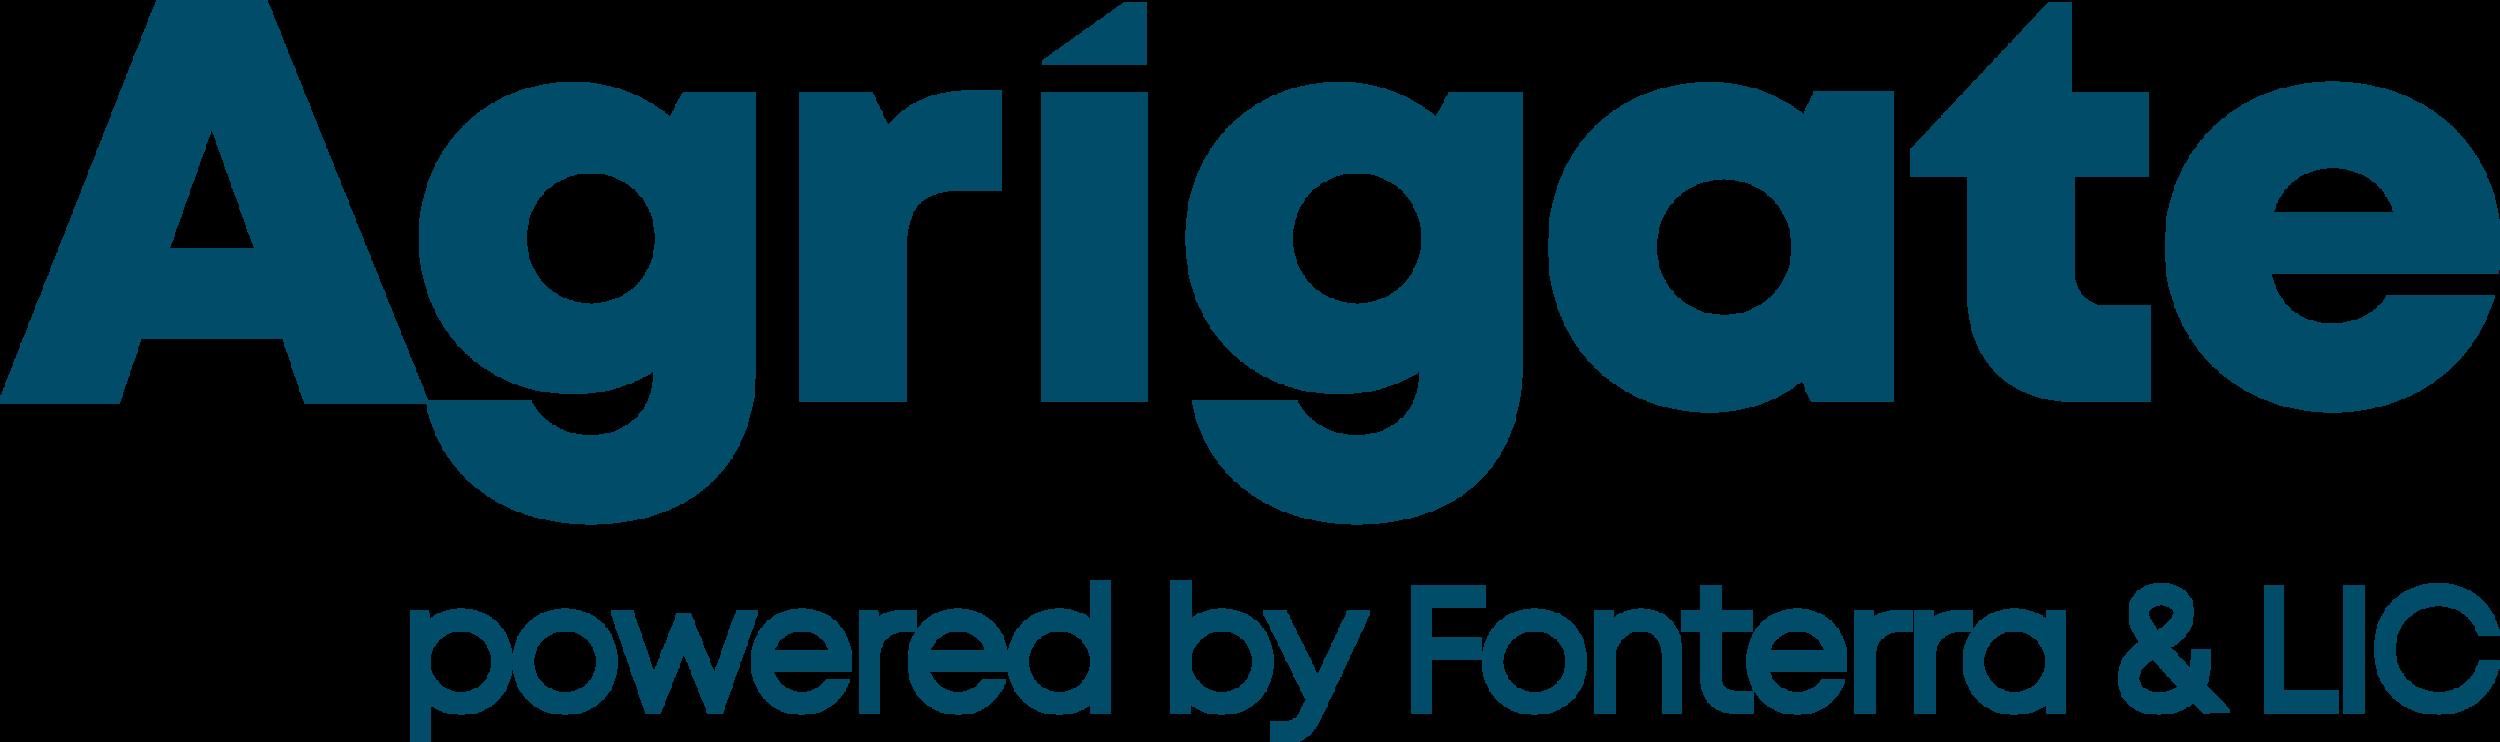 Agrigate